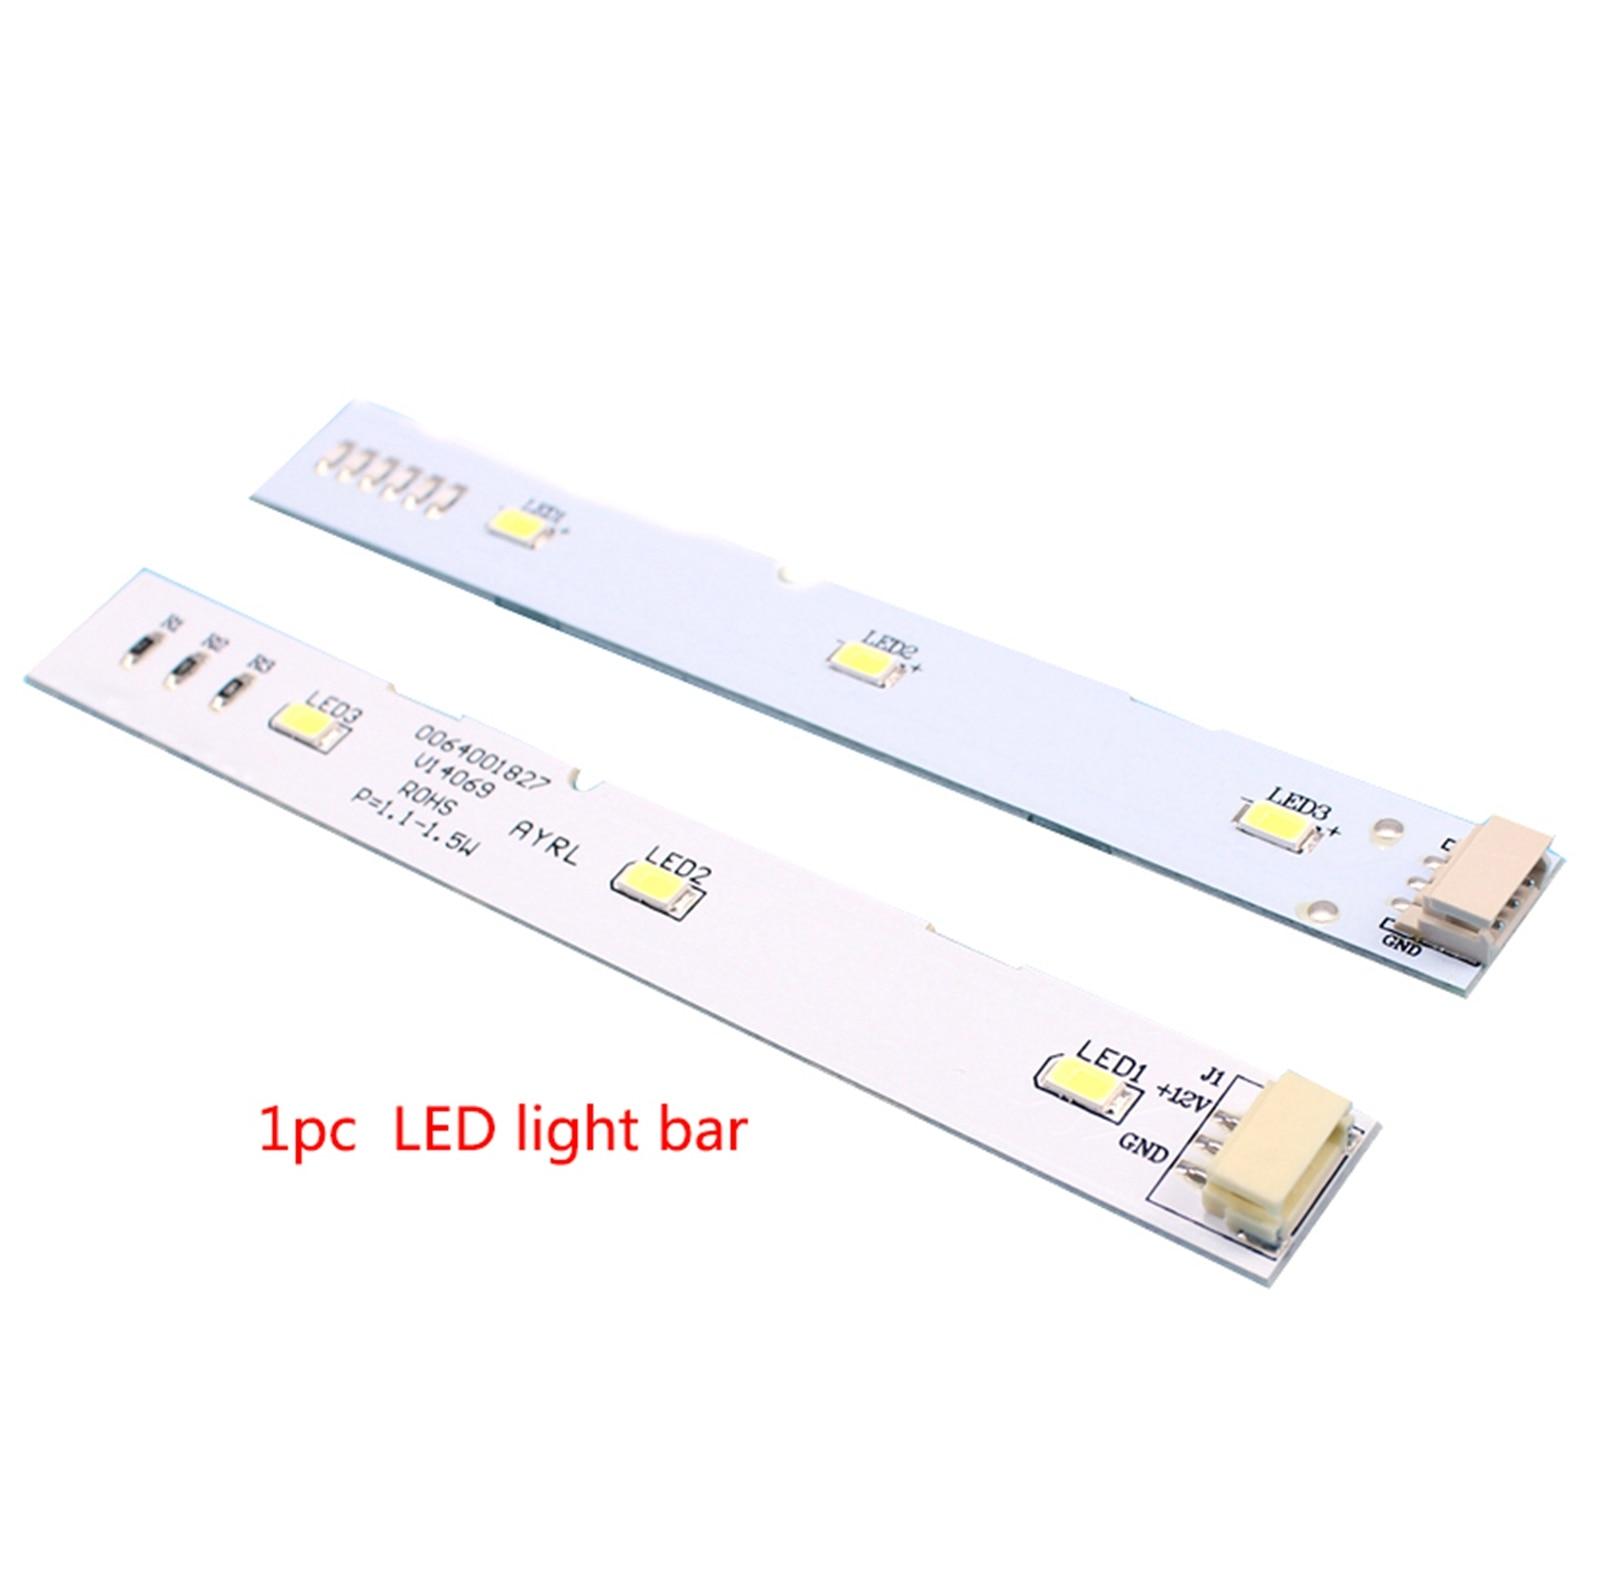 LED Backlight Strip Lamp For Haier BCD-575WDBI 0064001827 Front-door Refrigerator LED Lamp Bar Accessories